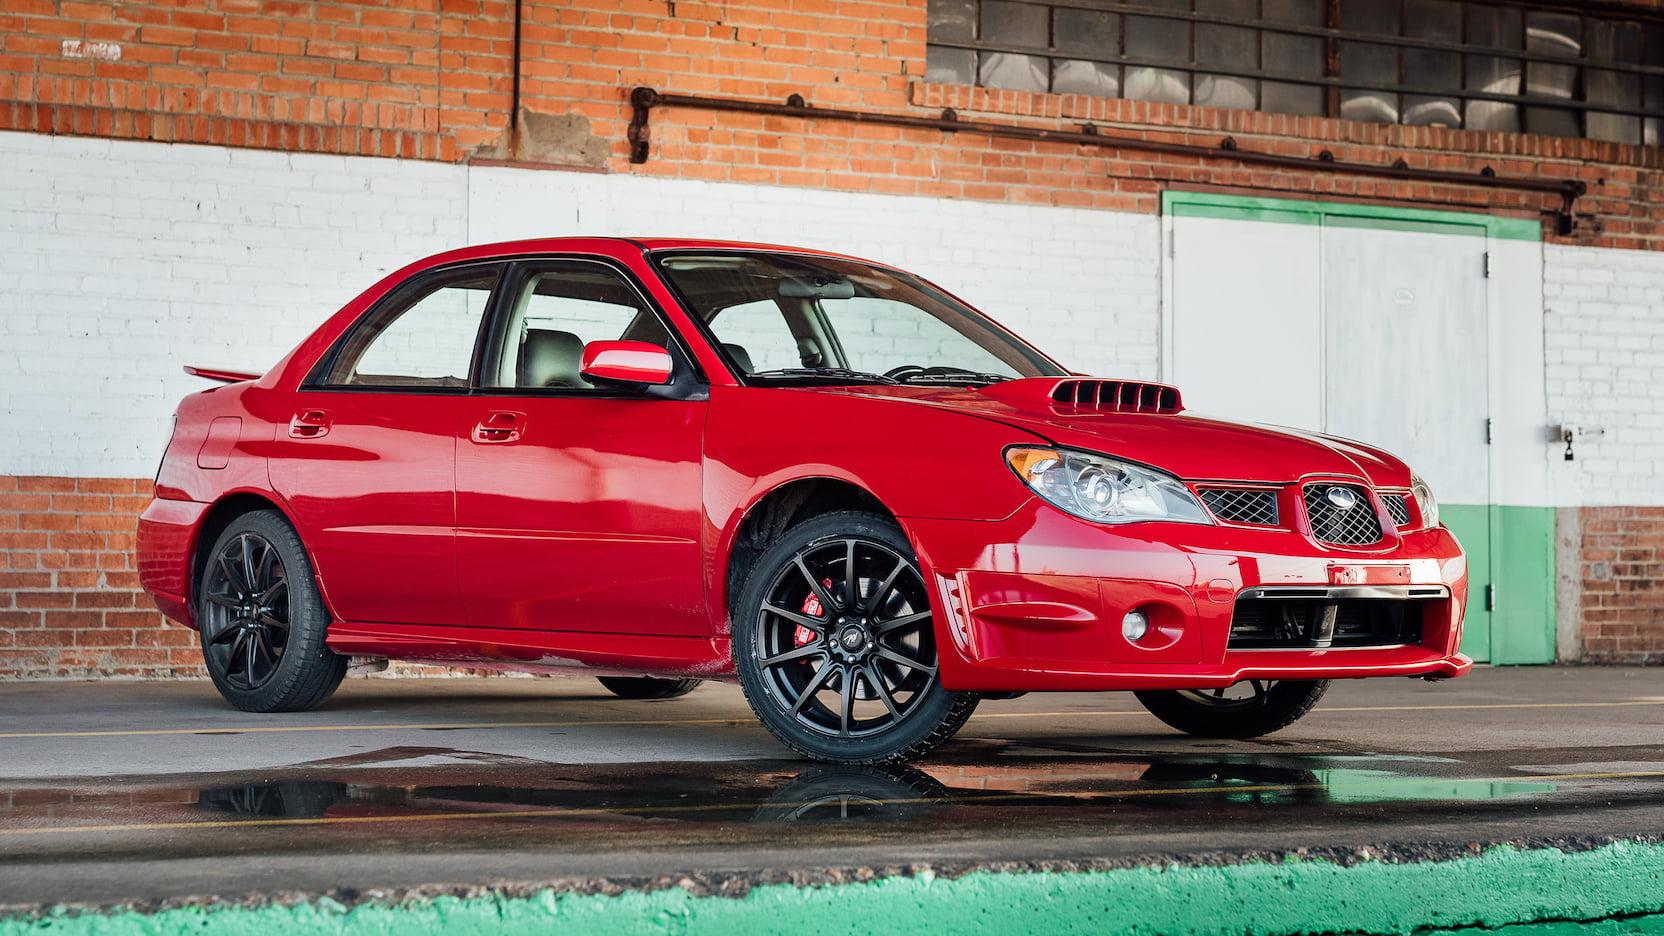 You can own Baby Driver's red Subaru WRX getaway car thumbnail